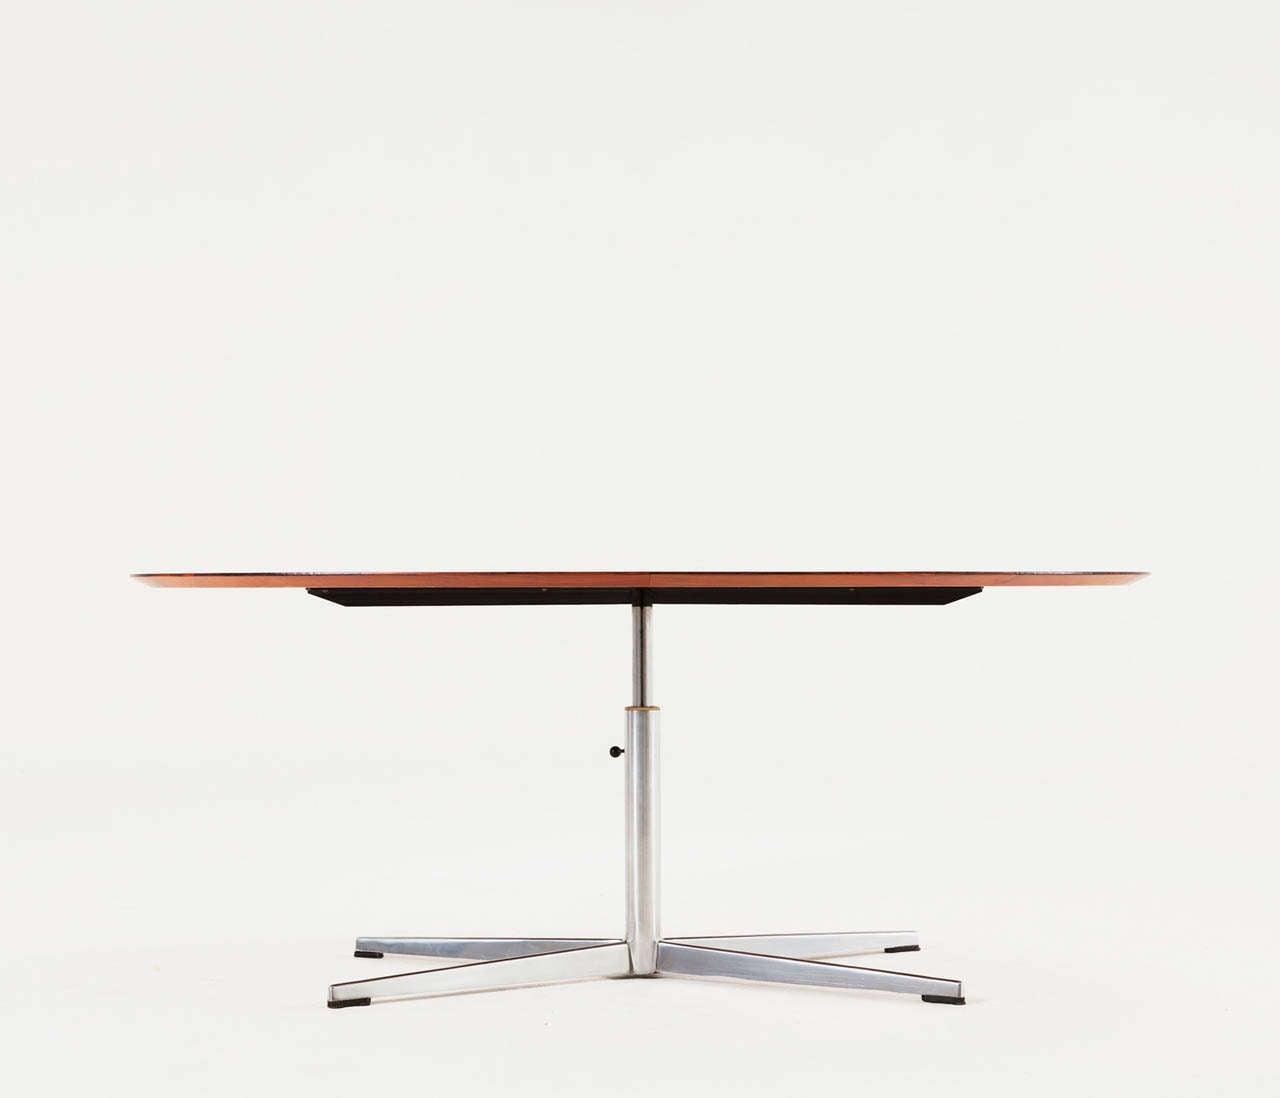 oval rosewood table with height adjustable pedestal base at 1stdibs. Black Bedroom Furniture Sets. Home Design Ideas